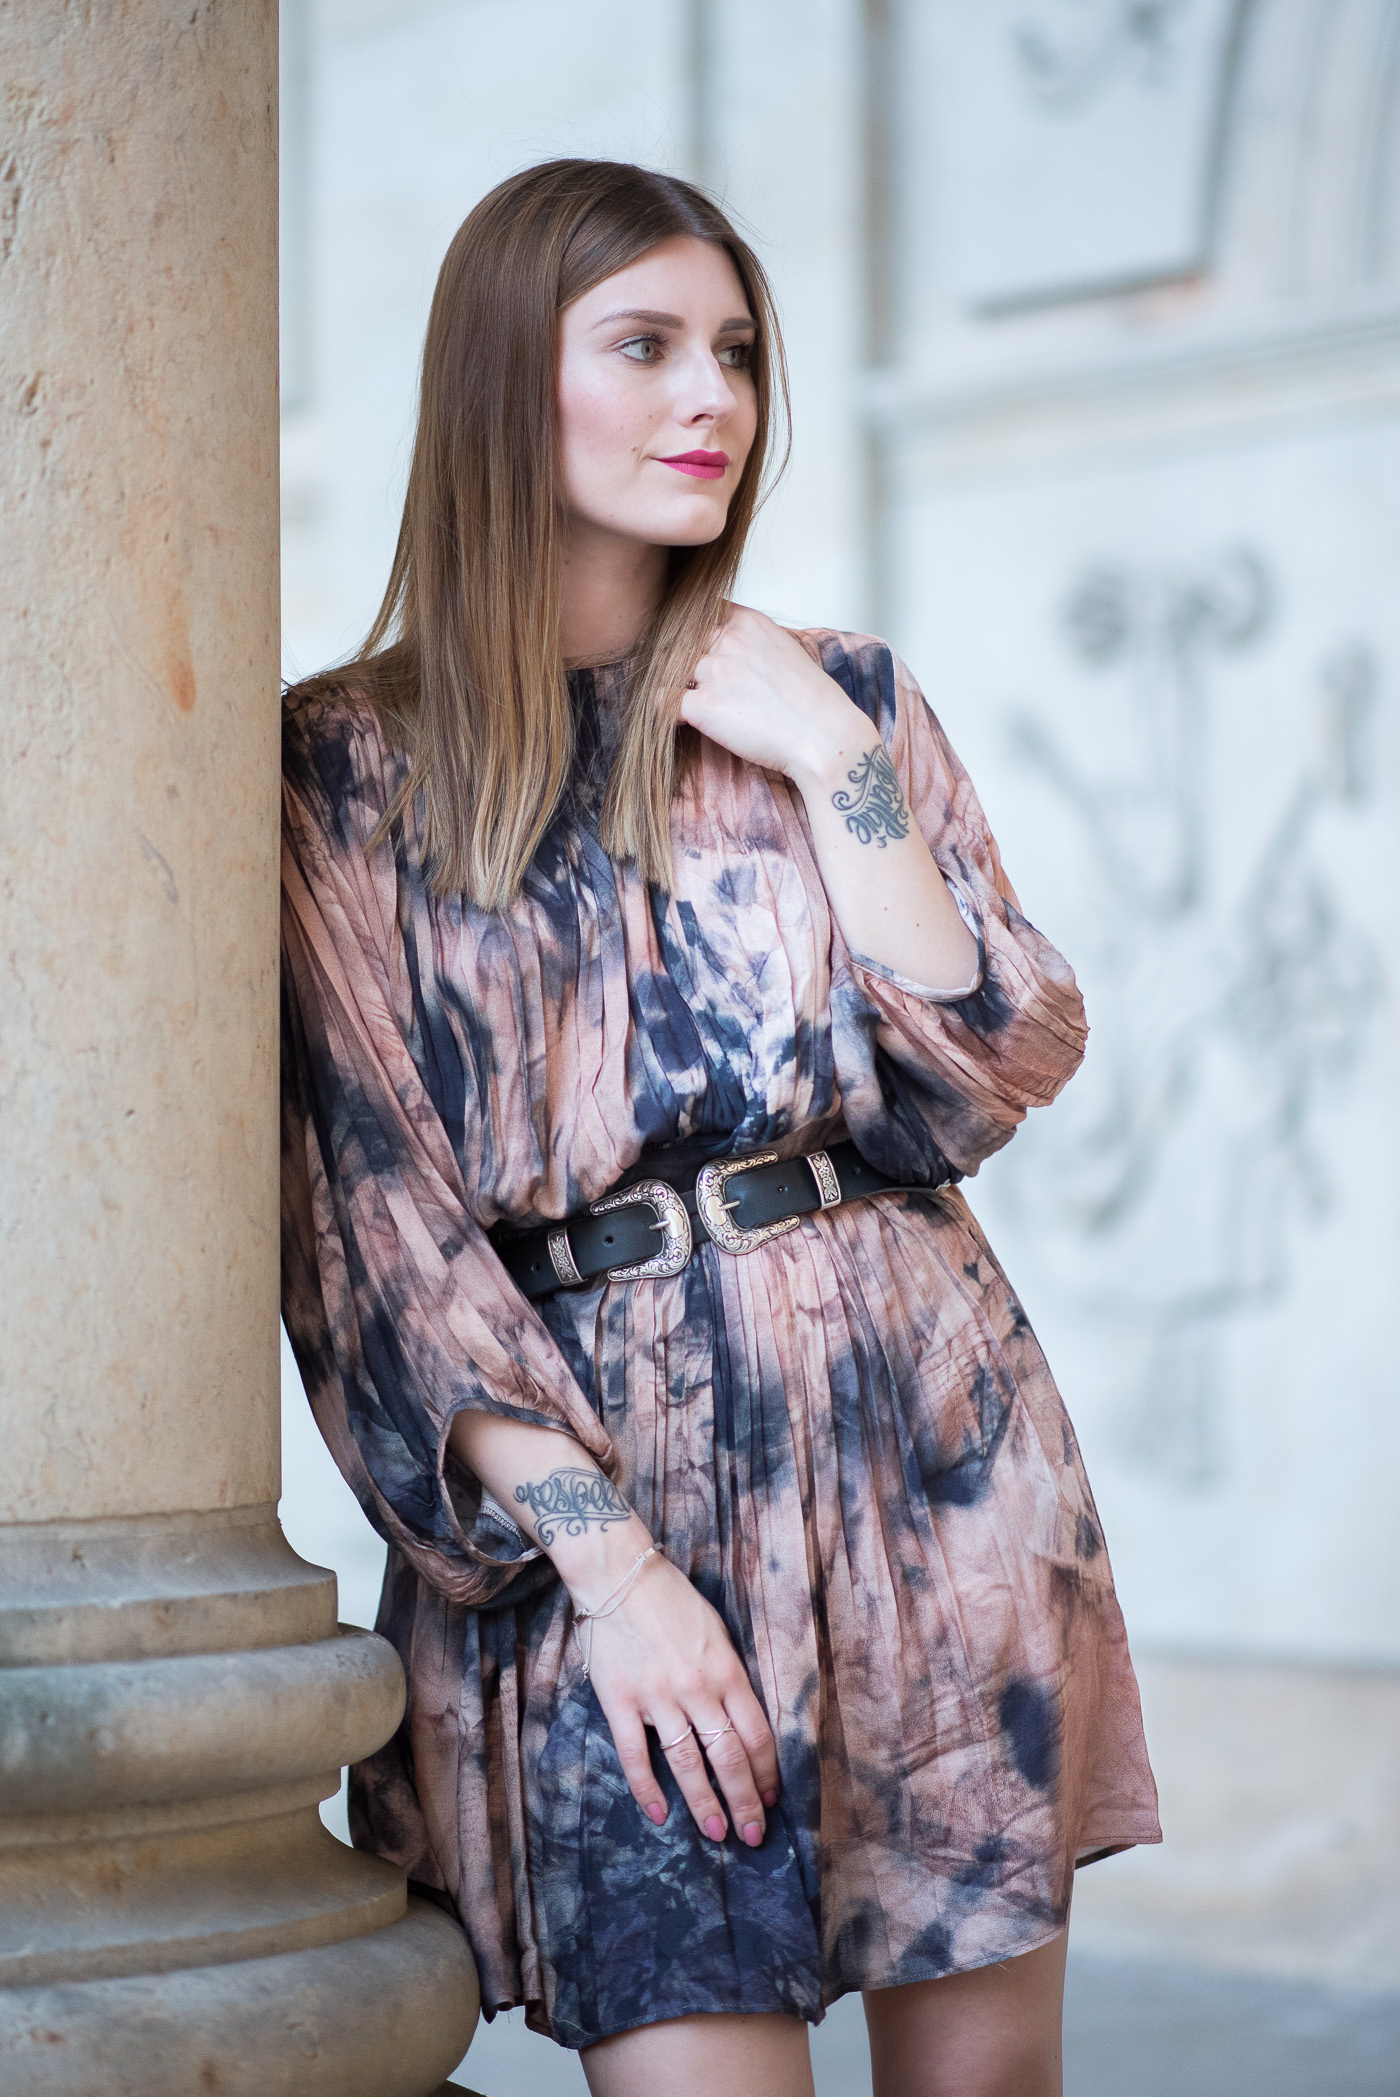 Berlin_Fashion_Week_Ready_Outfit_2